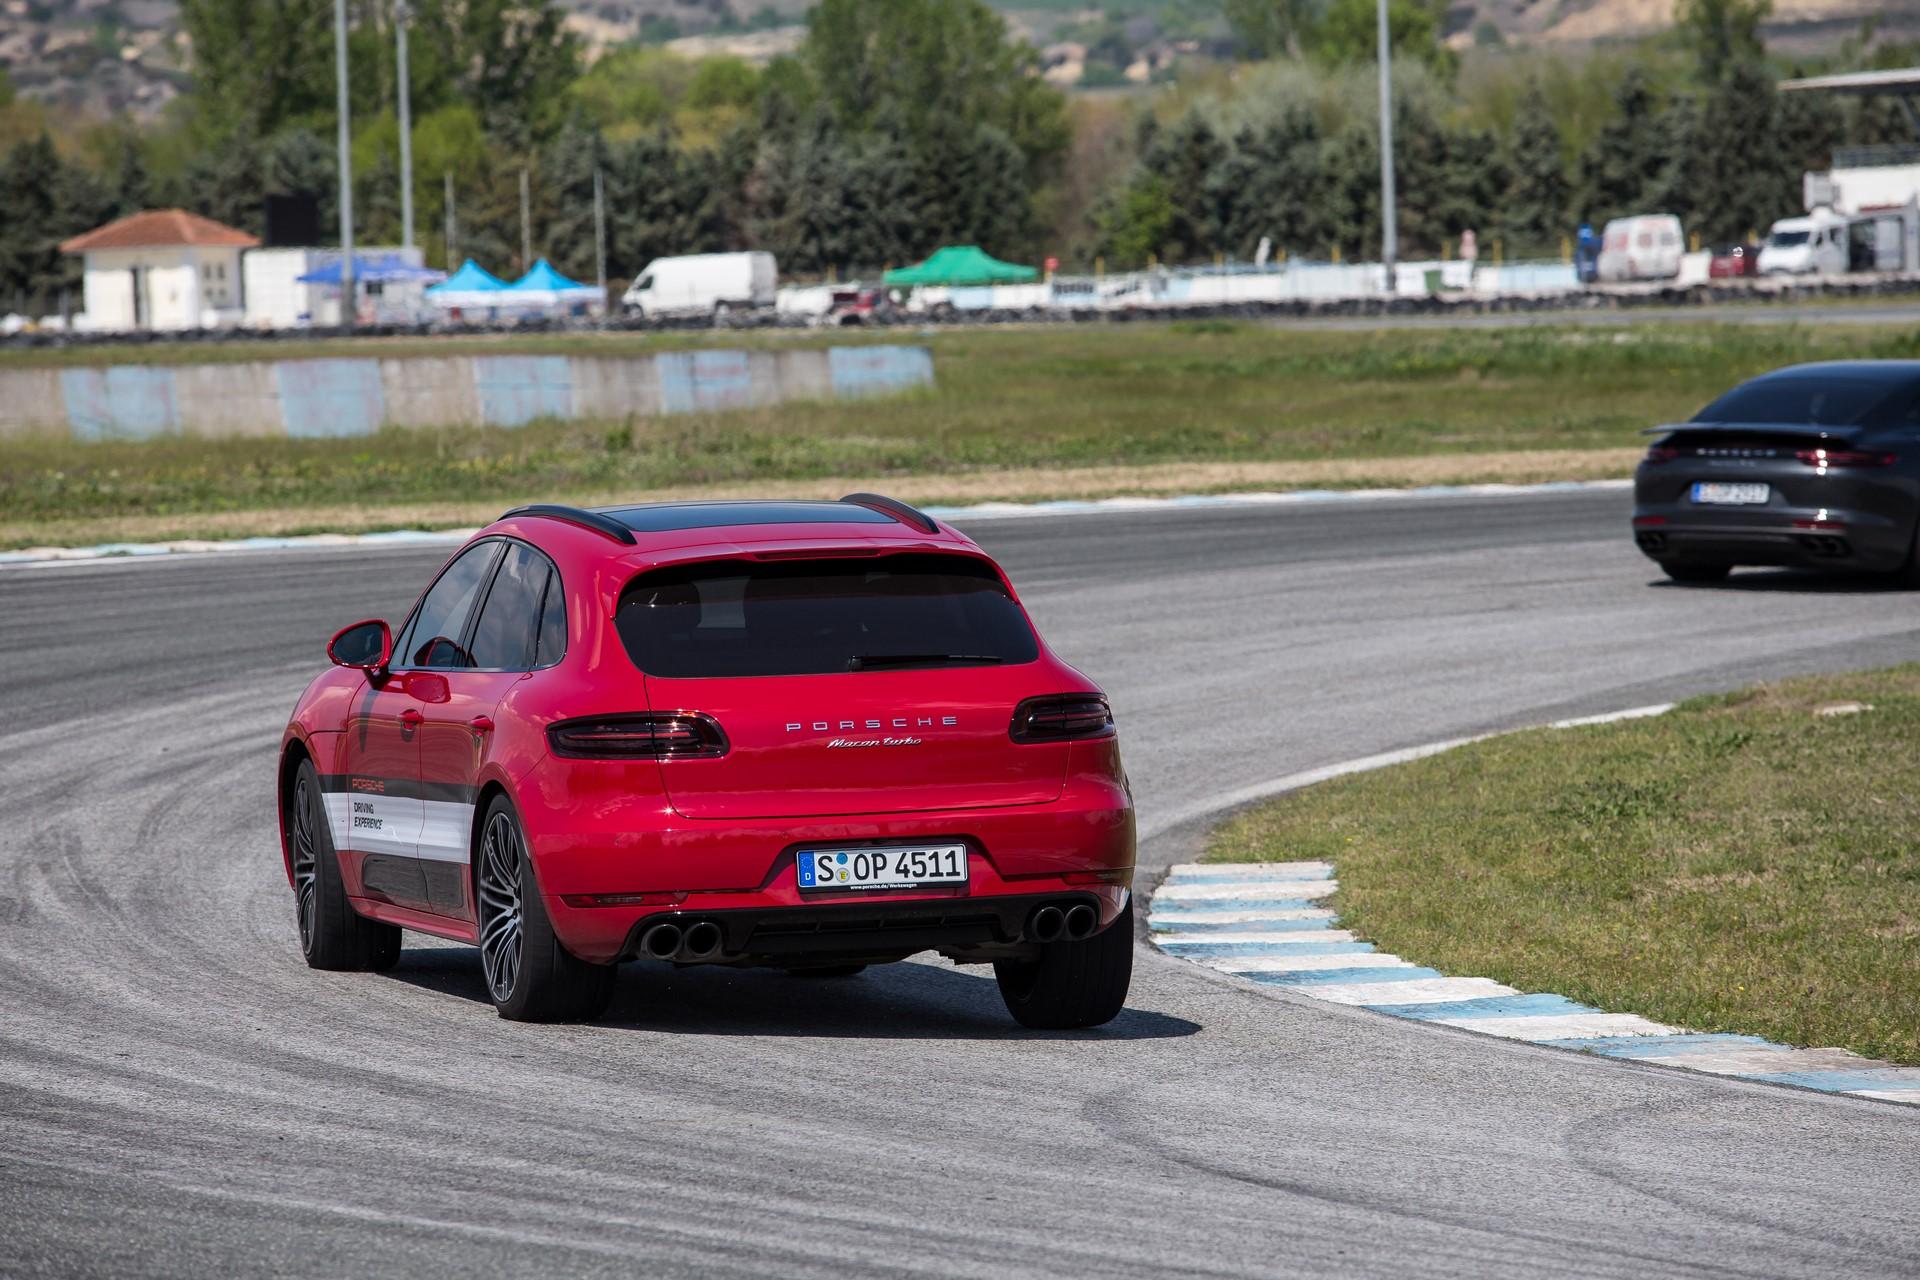 Porsche Driving Experience 2017 Serres (143)